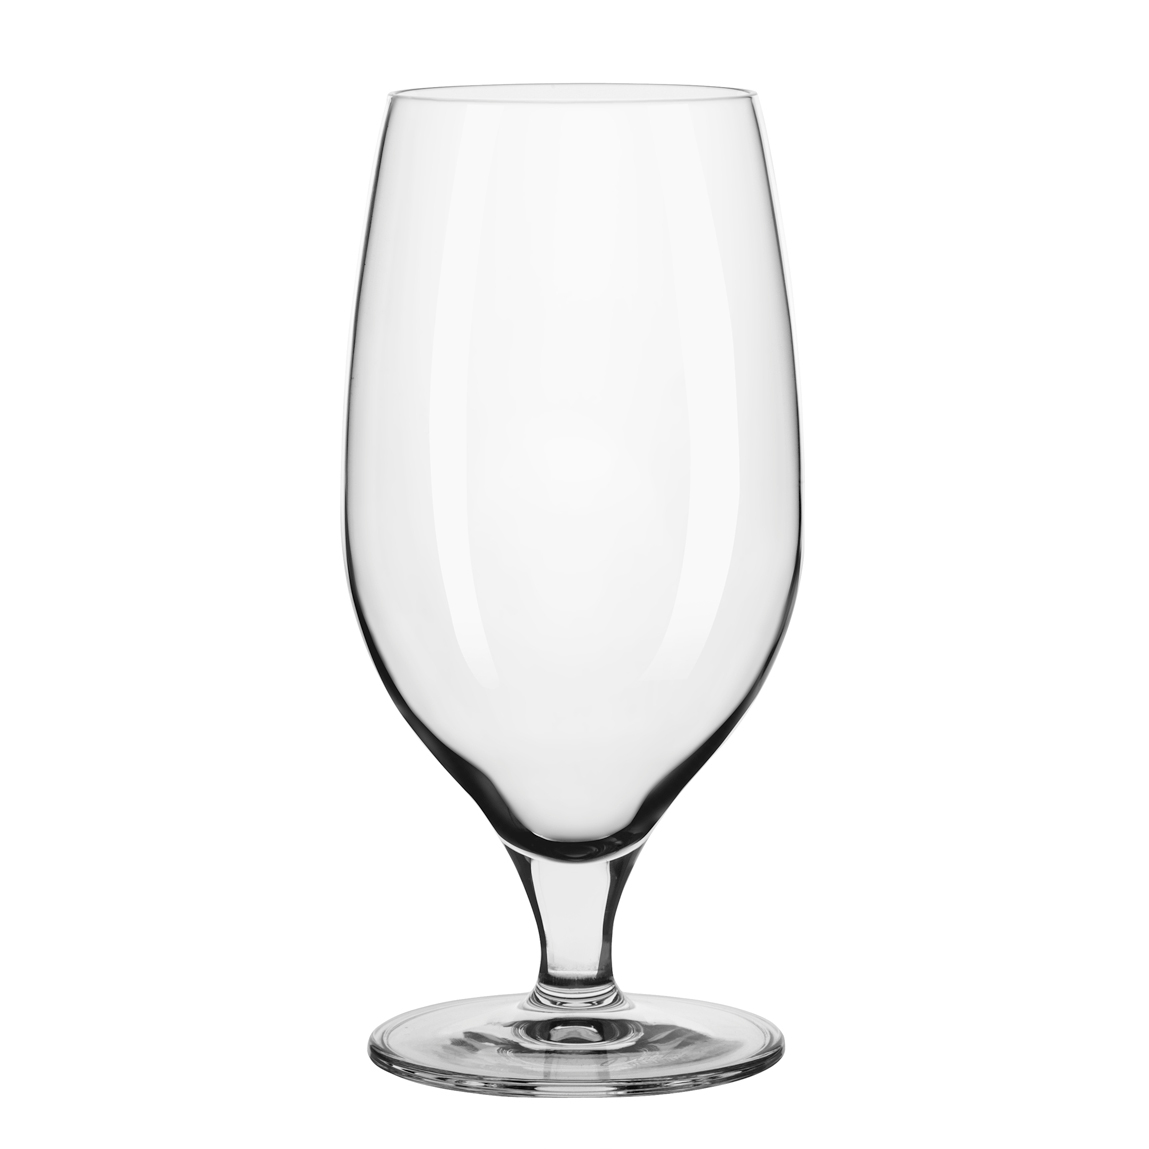 Libbey Glass 9146 glass, goblet